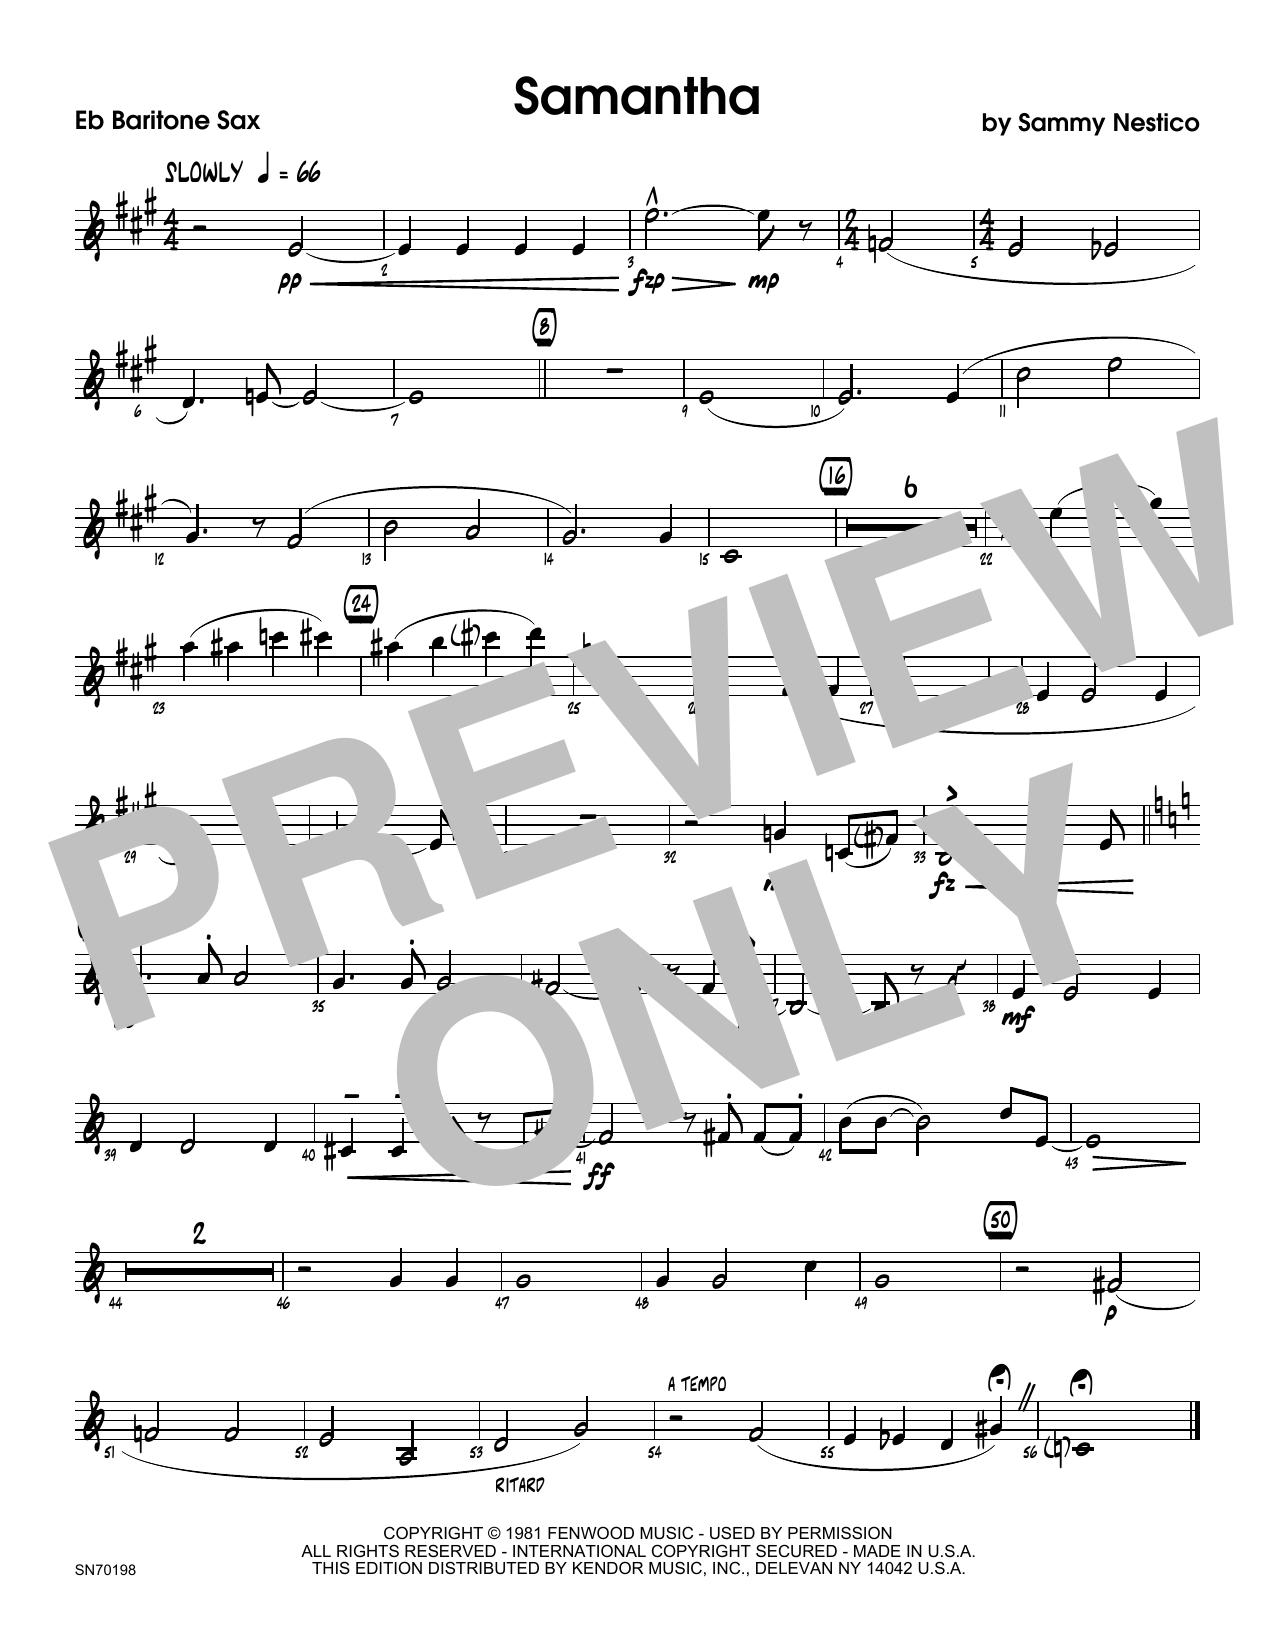 Samantha - Eb Baritone Saxophone